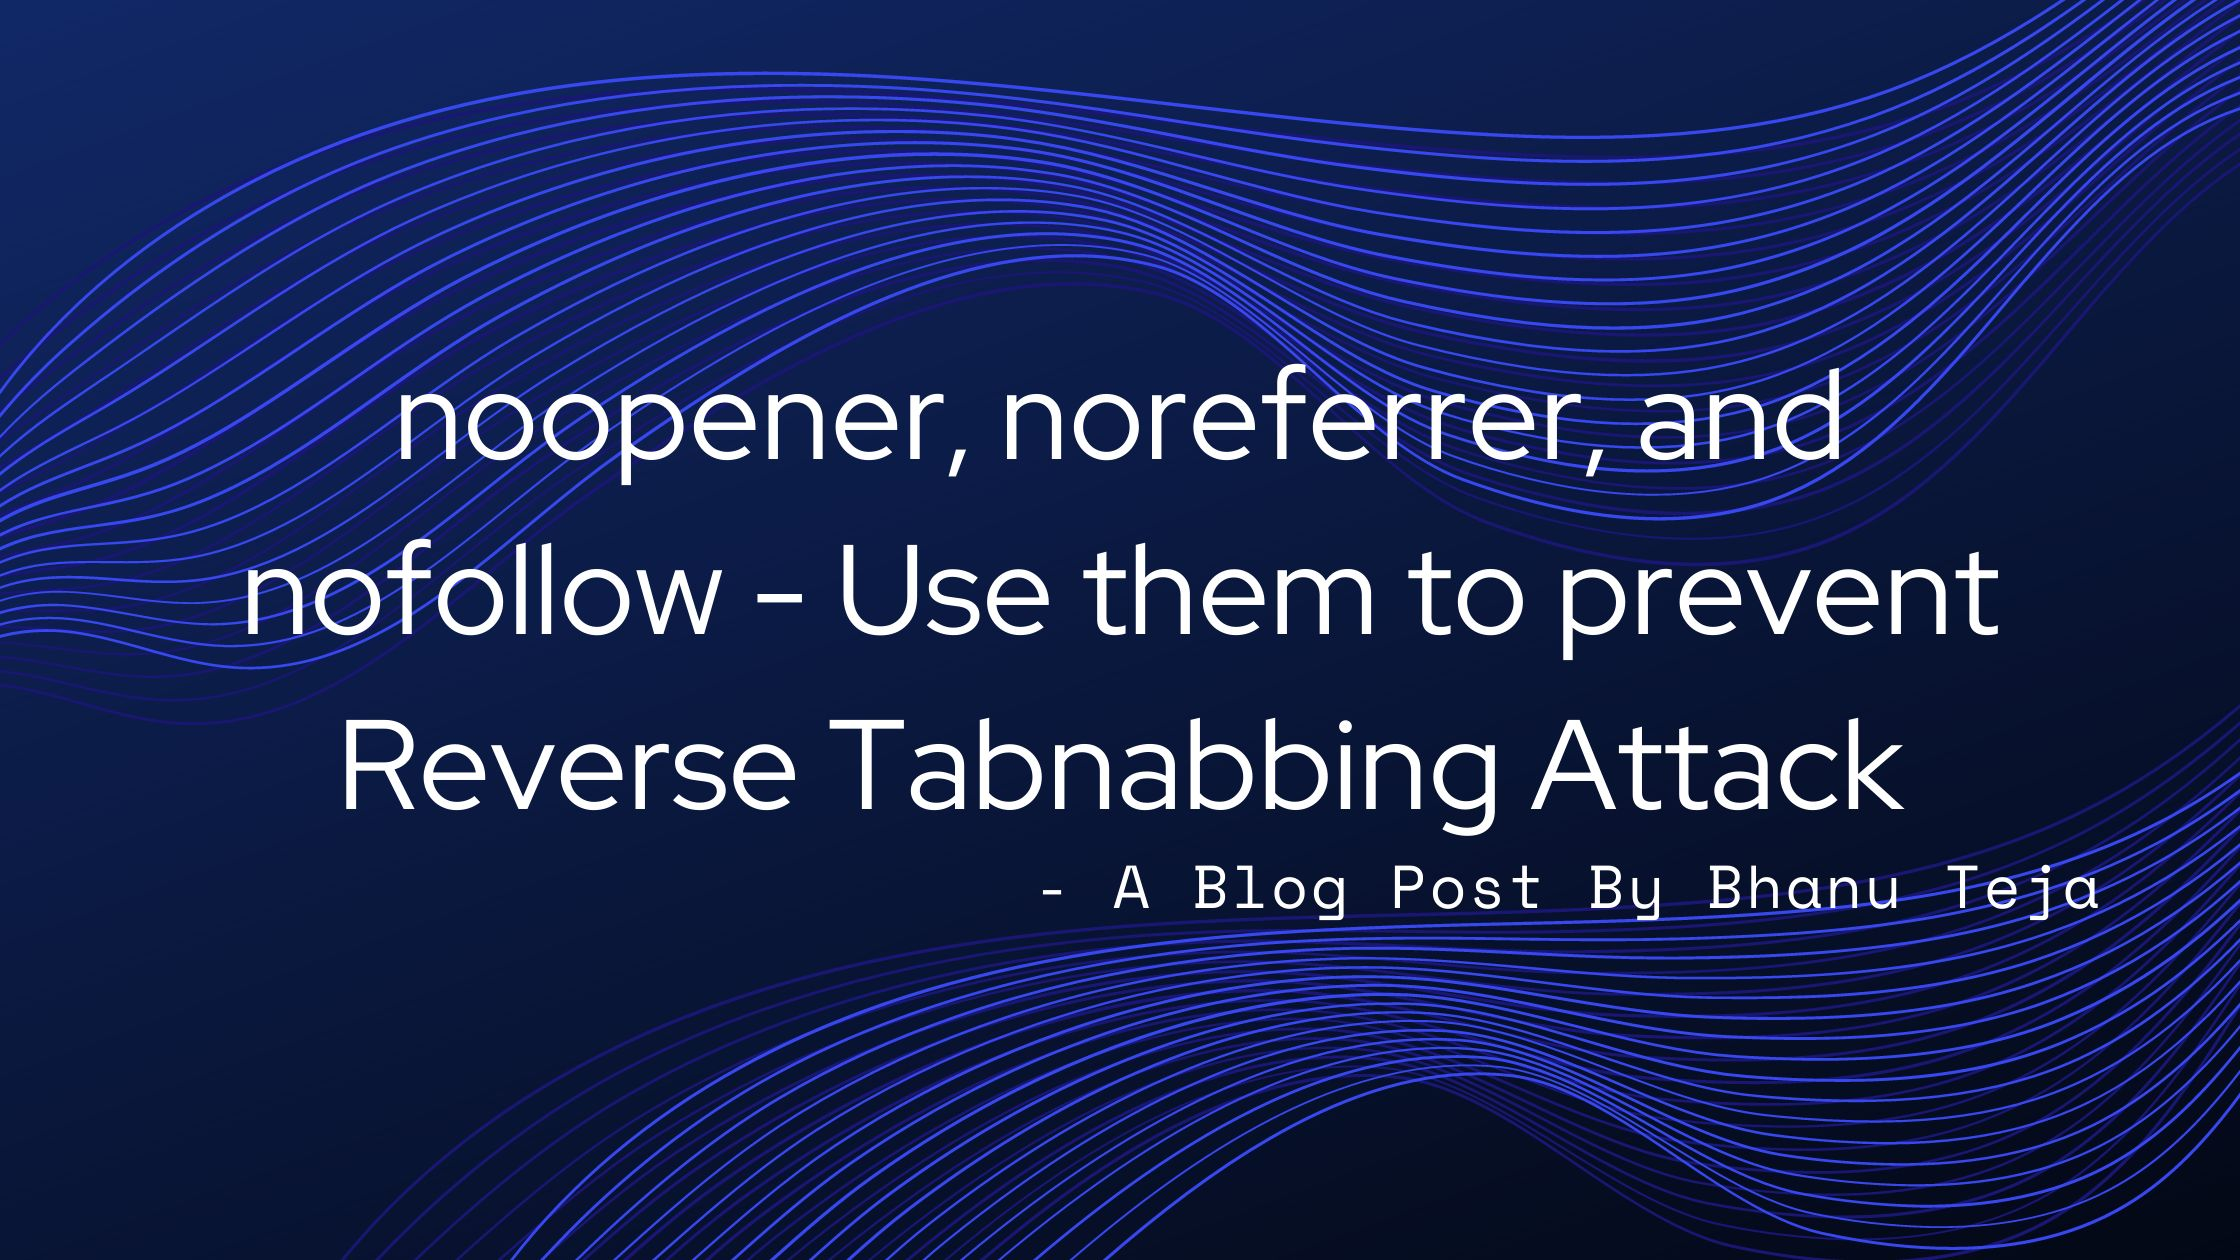 Prevent Reverse Tabnabbing Attacks With Proper noopener, noreferrer, and nofollow Attribution | Hacker Noon